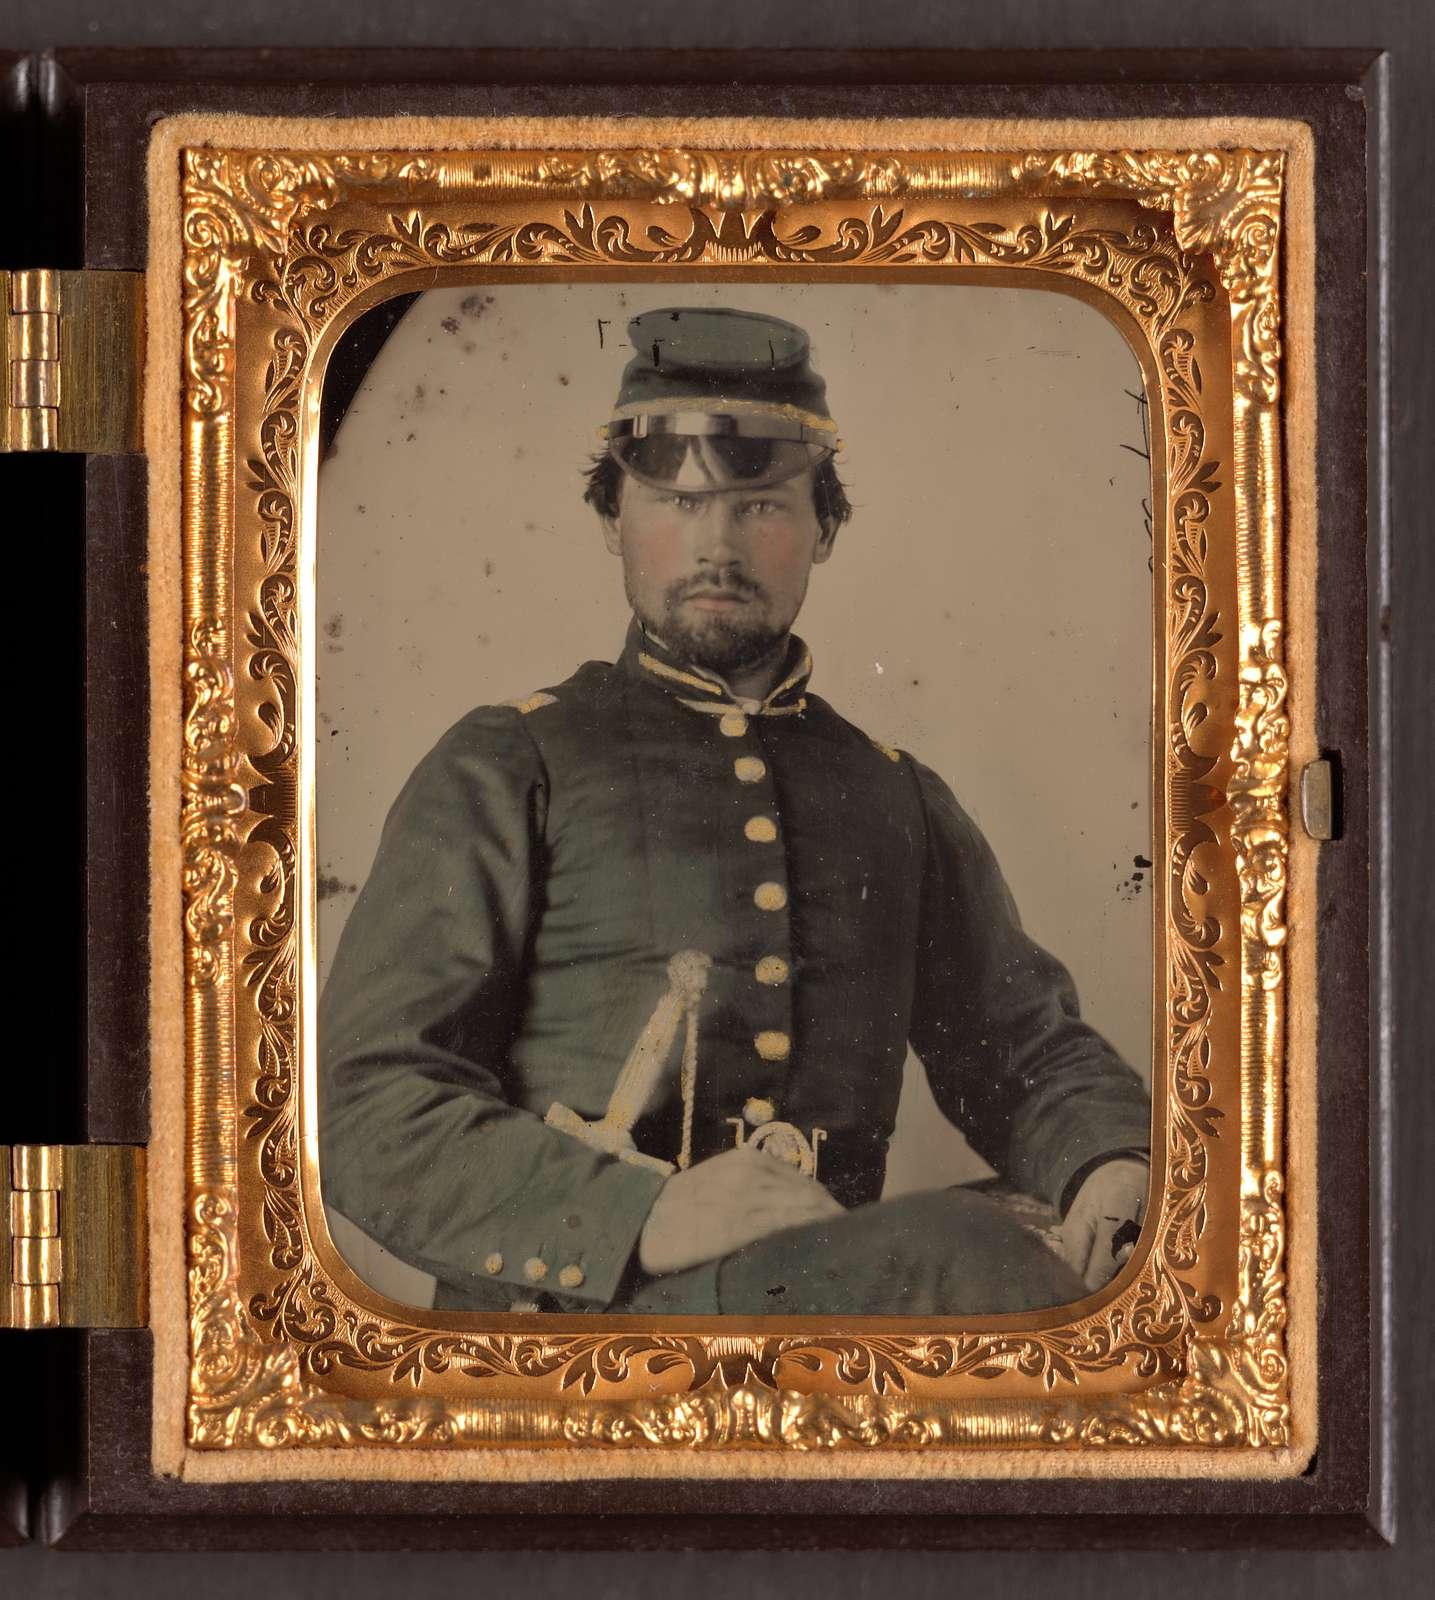 [Lieutenant Thomas S. McLane of Co. A, 41st Georgia Infantry Regiment, in uniform with sword]